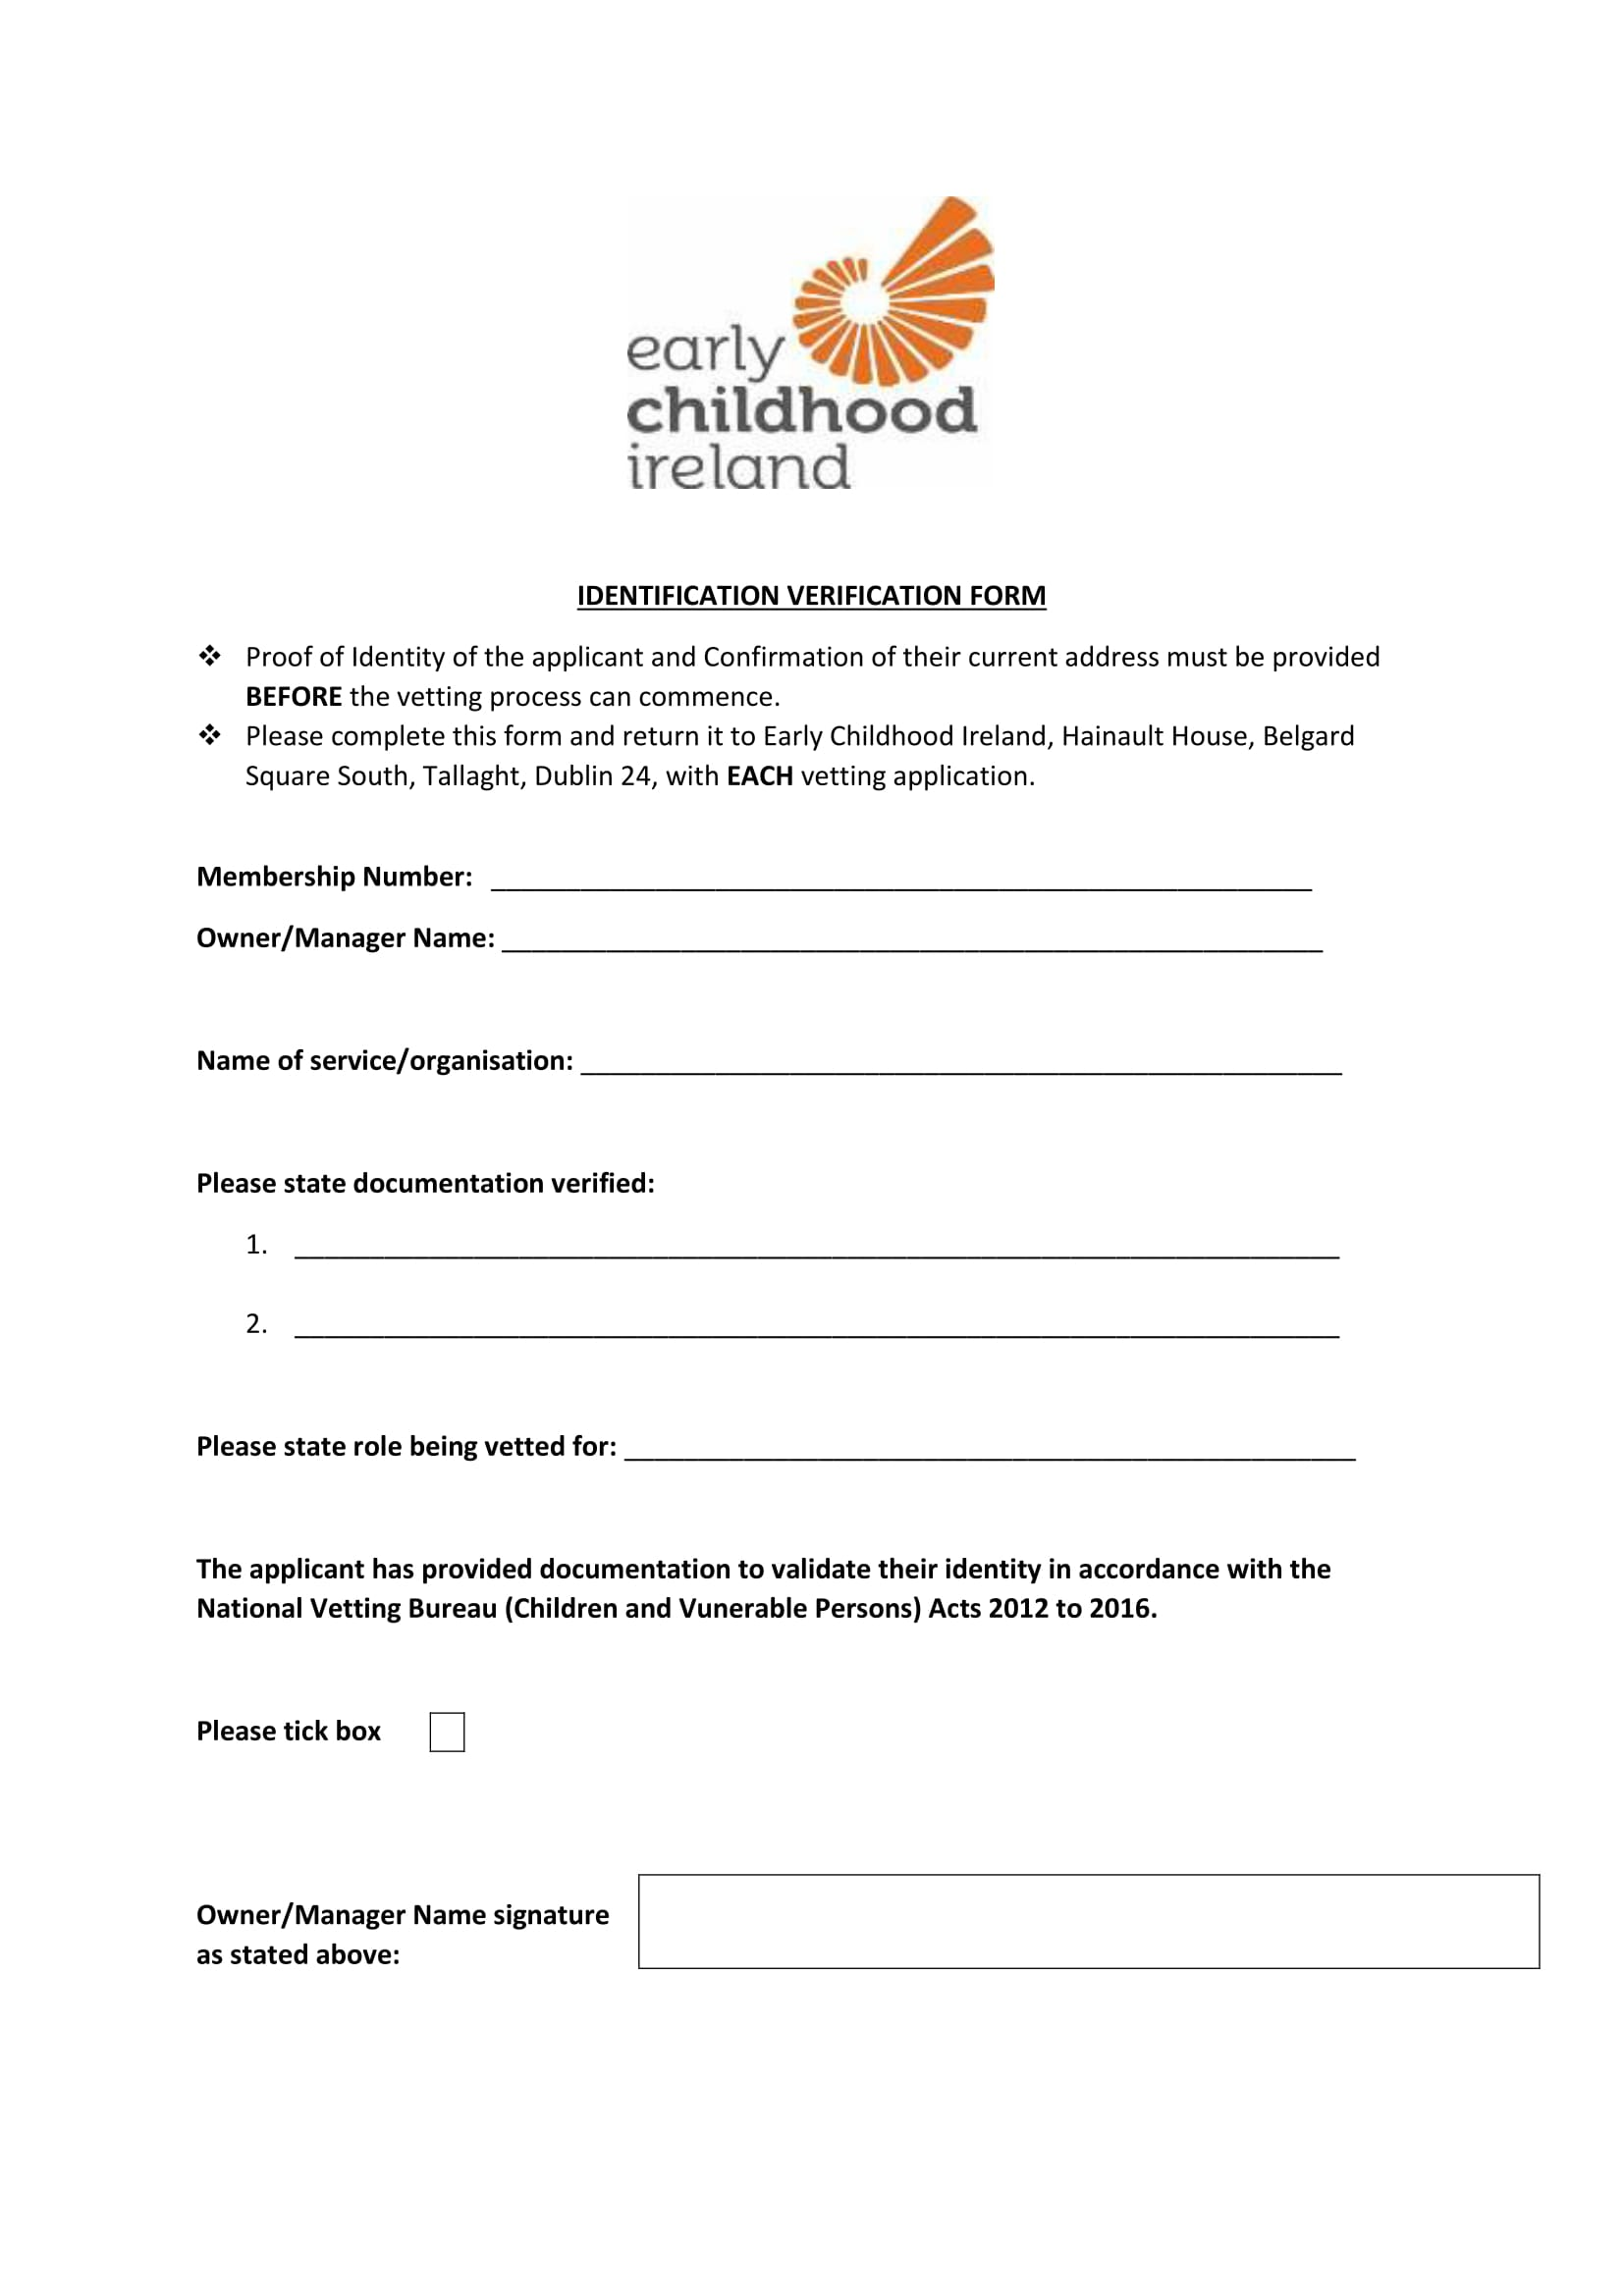 child identification verification form 1